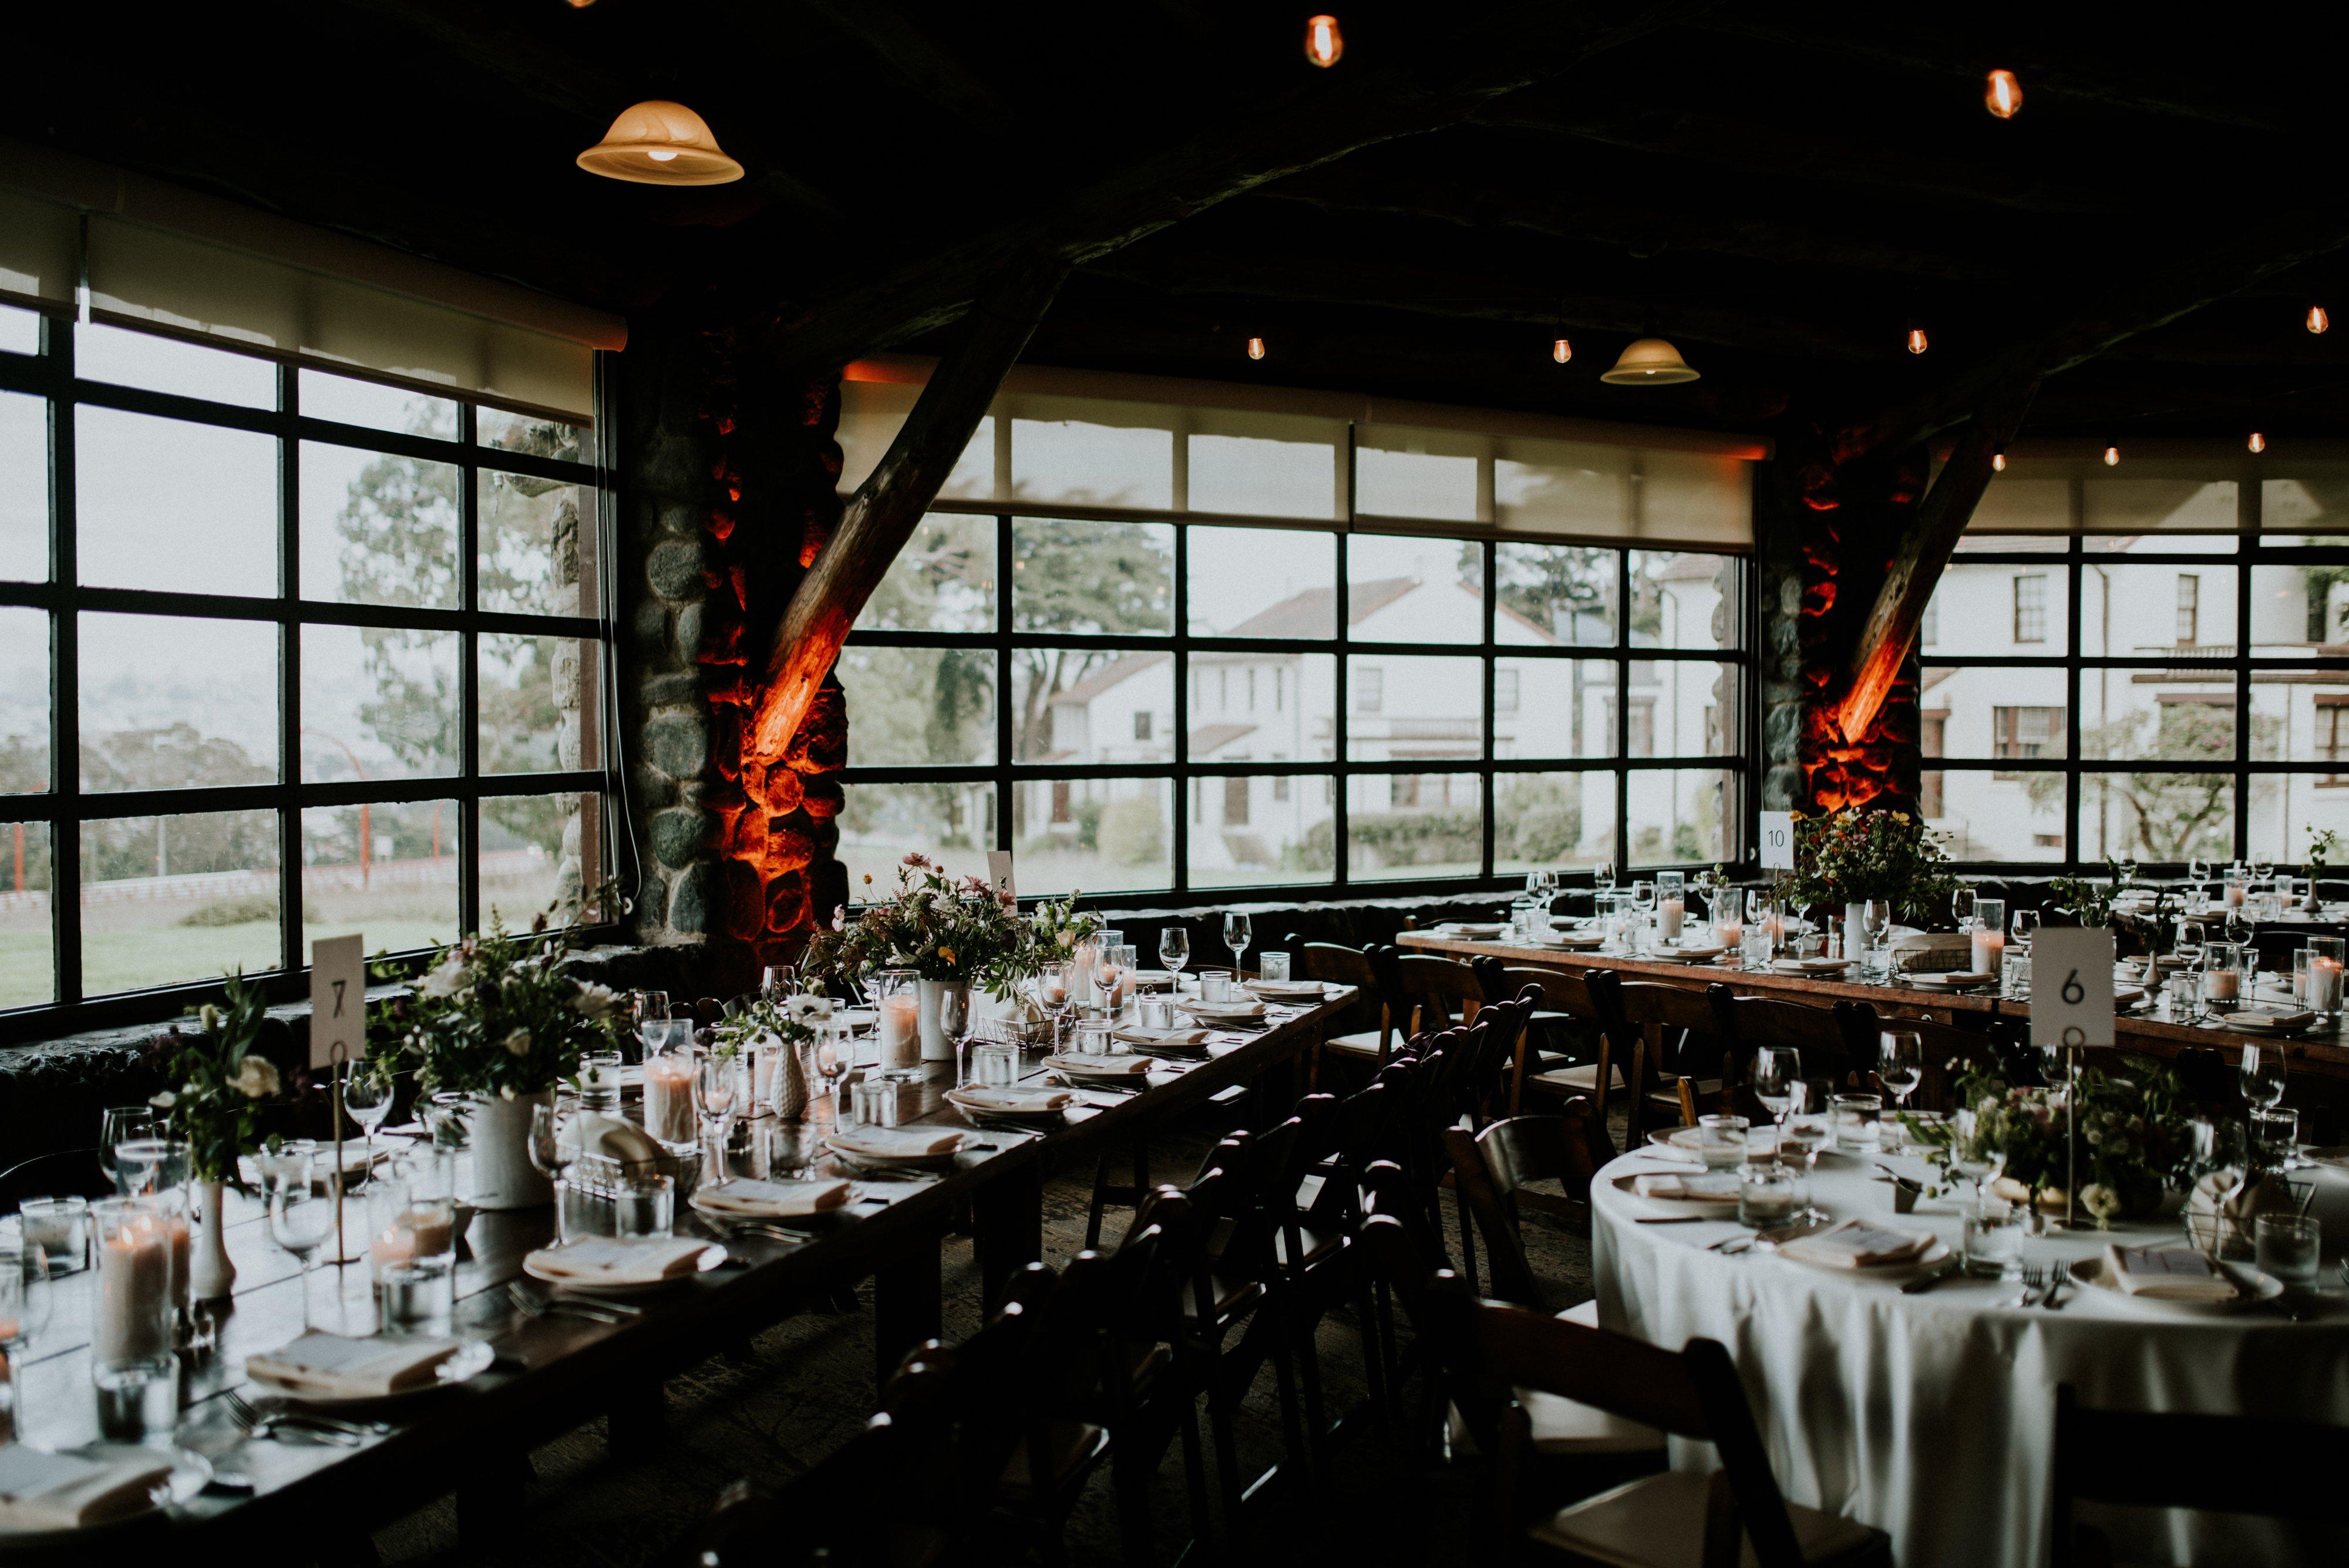 Presidio-WedgewoodWeddings-WeddingReception-KerryJoshWedding